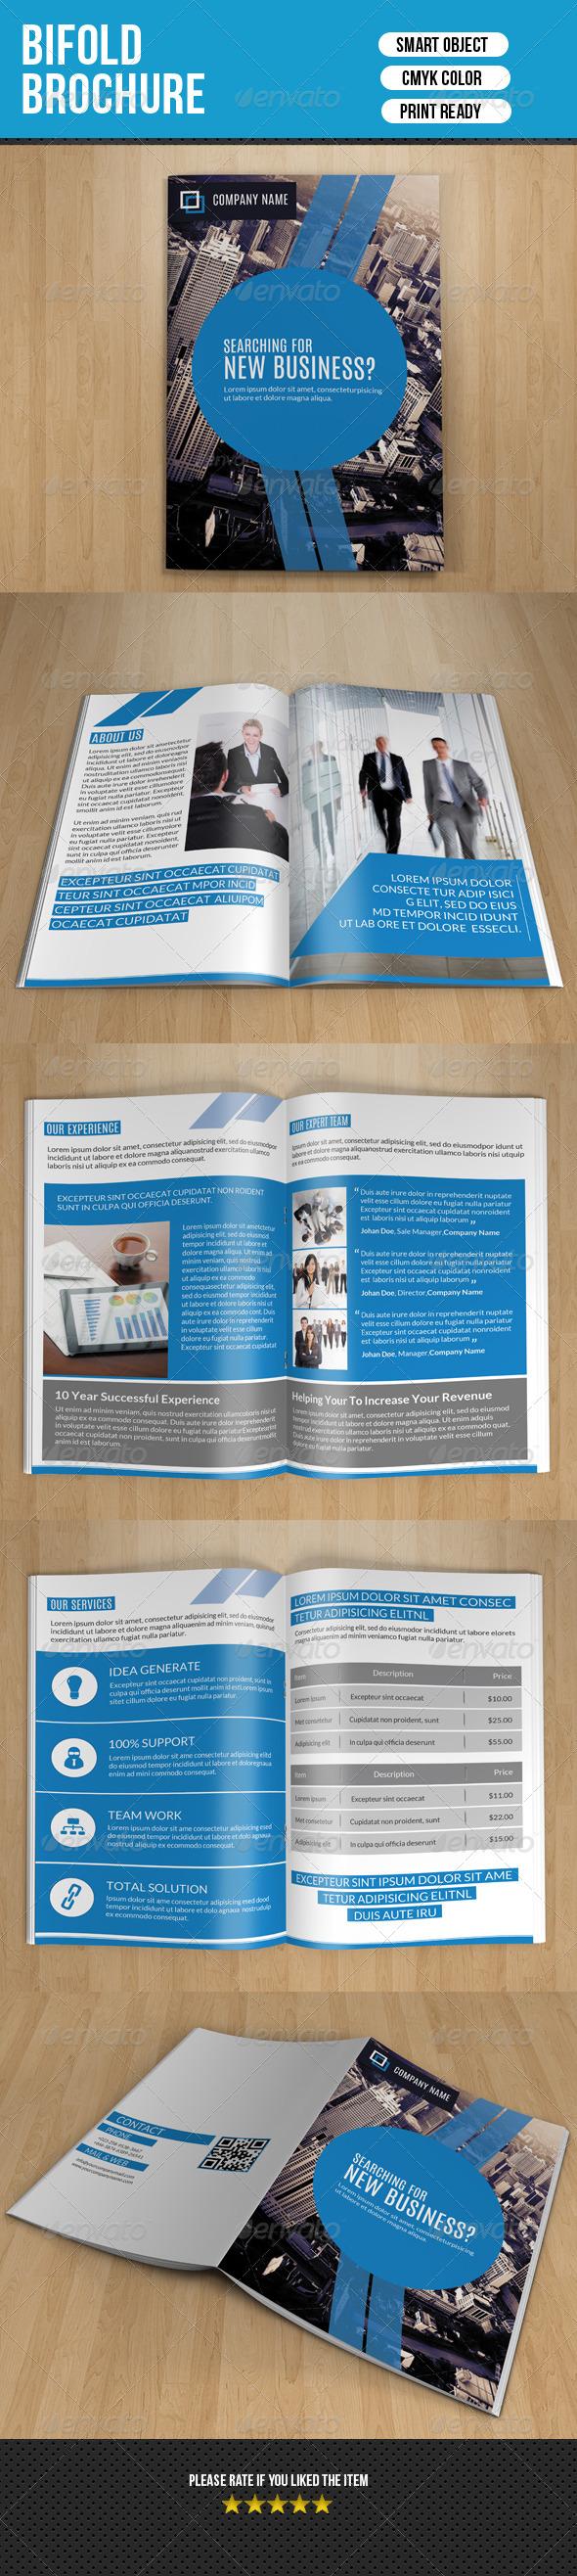 GraphicRiver Bifold Business Brochure-v64 8025185